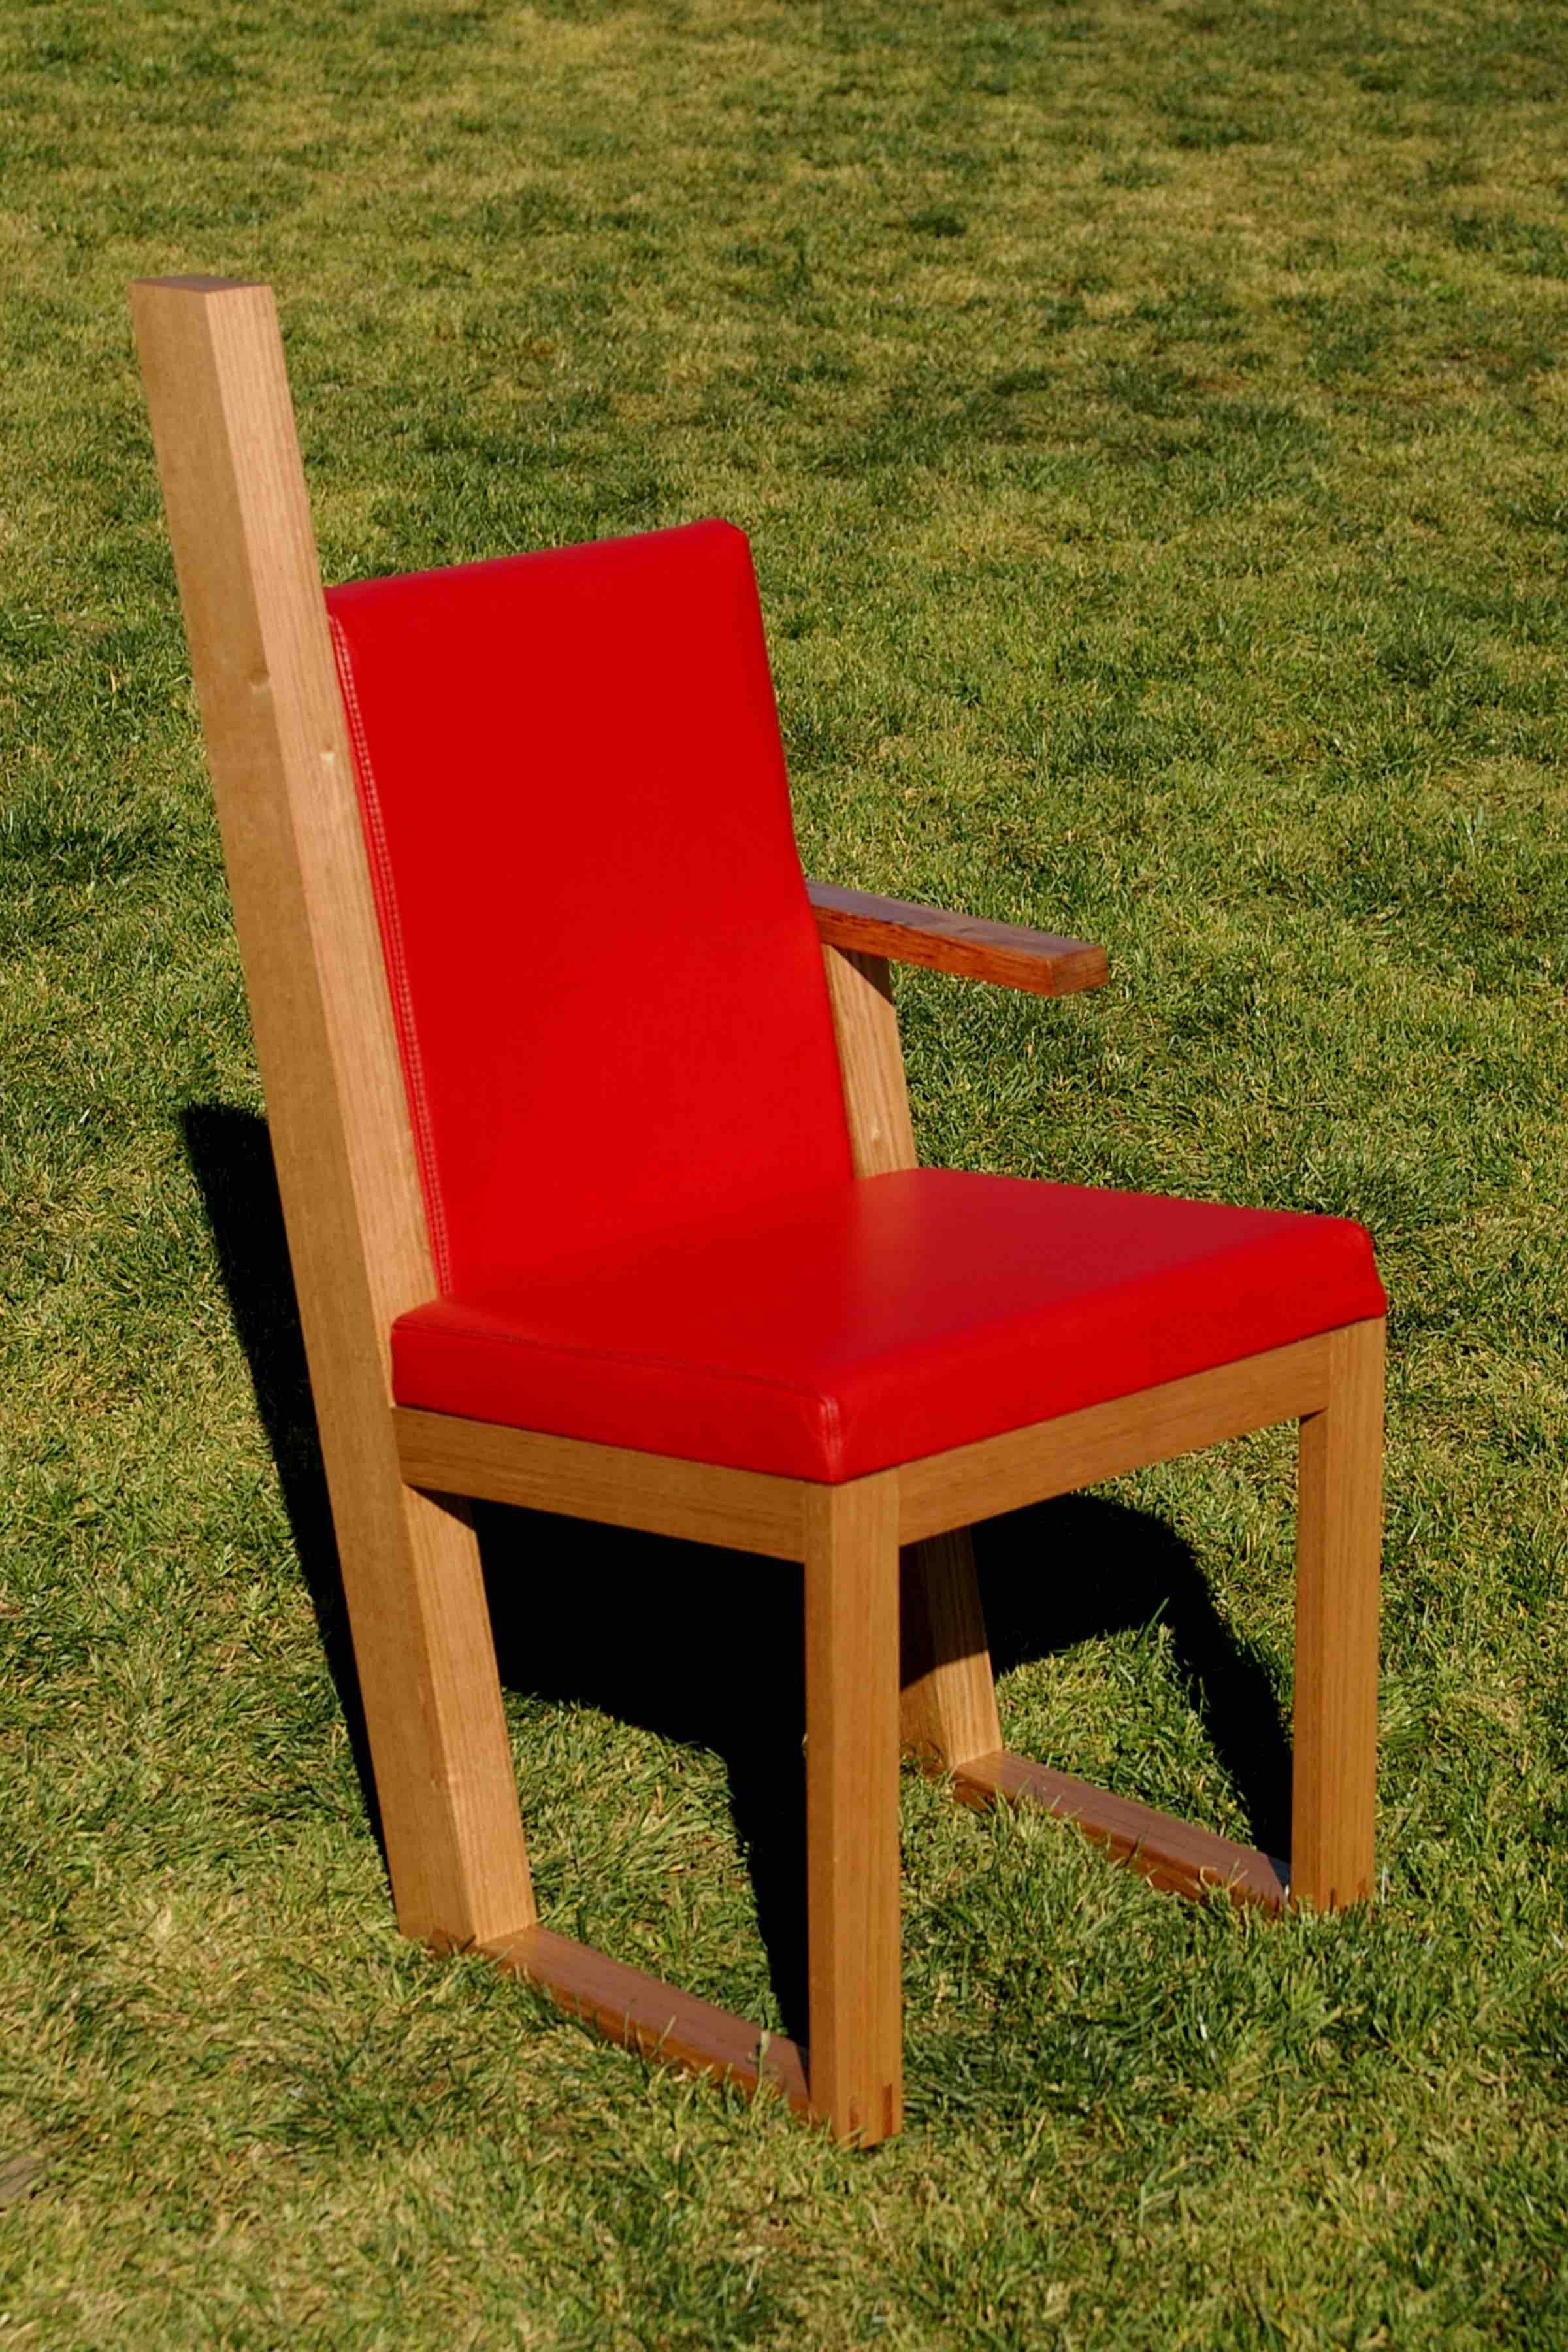 Chair1 copy.jpg